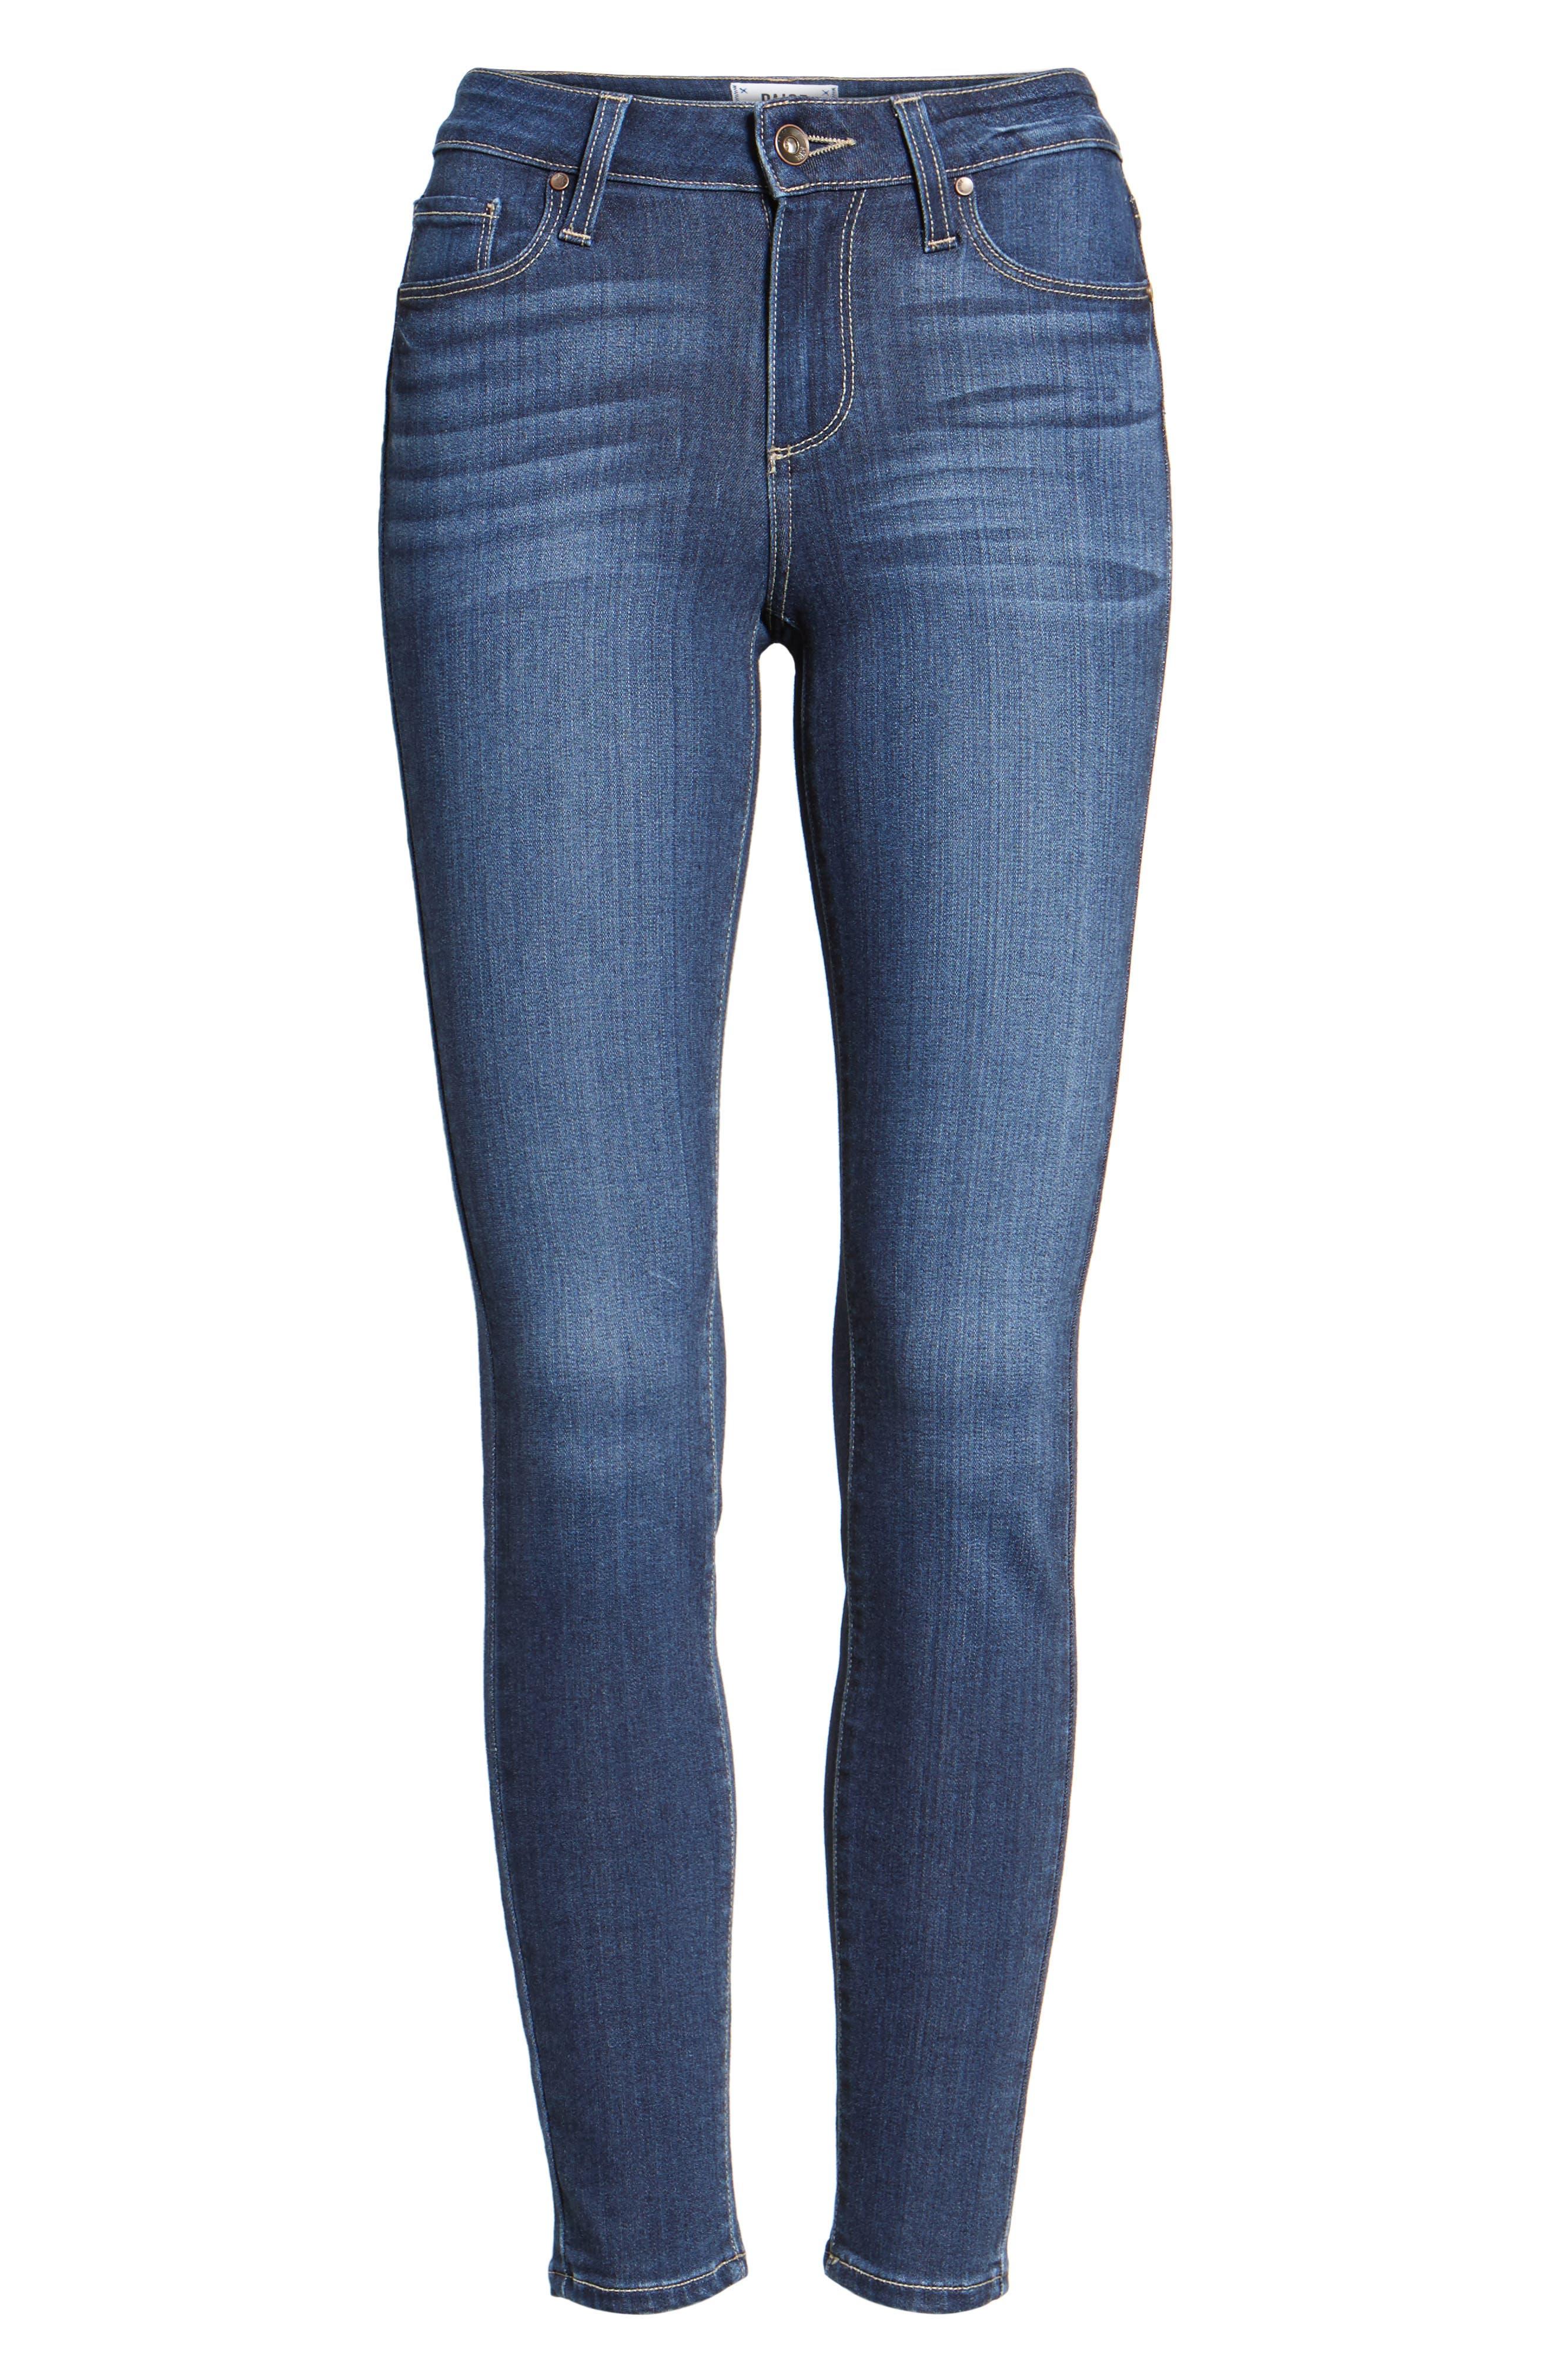 Transcend - Verdugo Ankle Skinny Jeans,                             Alternate thumbnail 6, color,